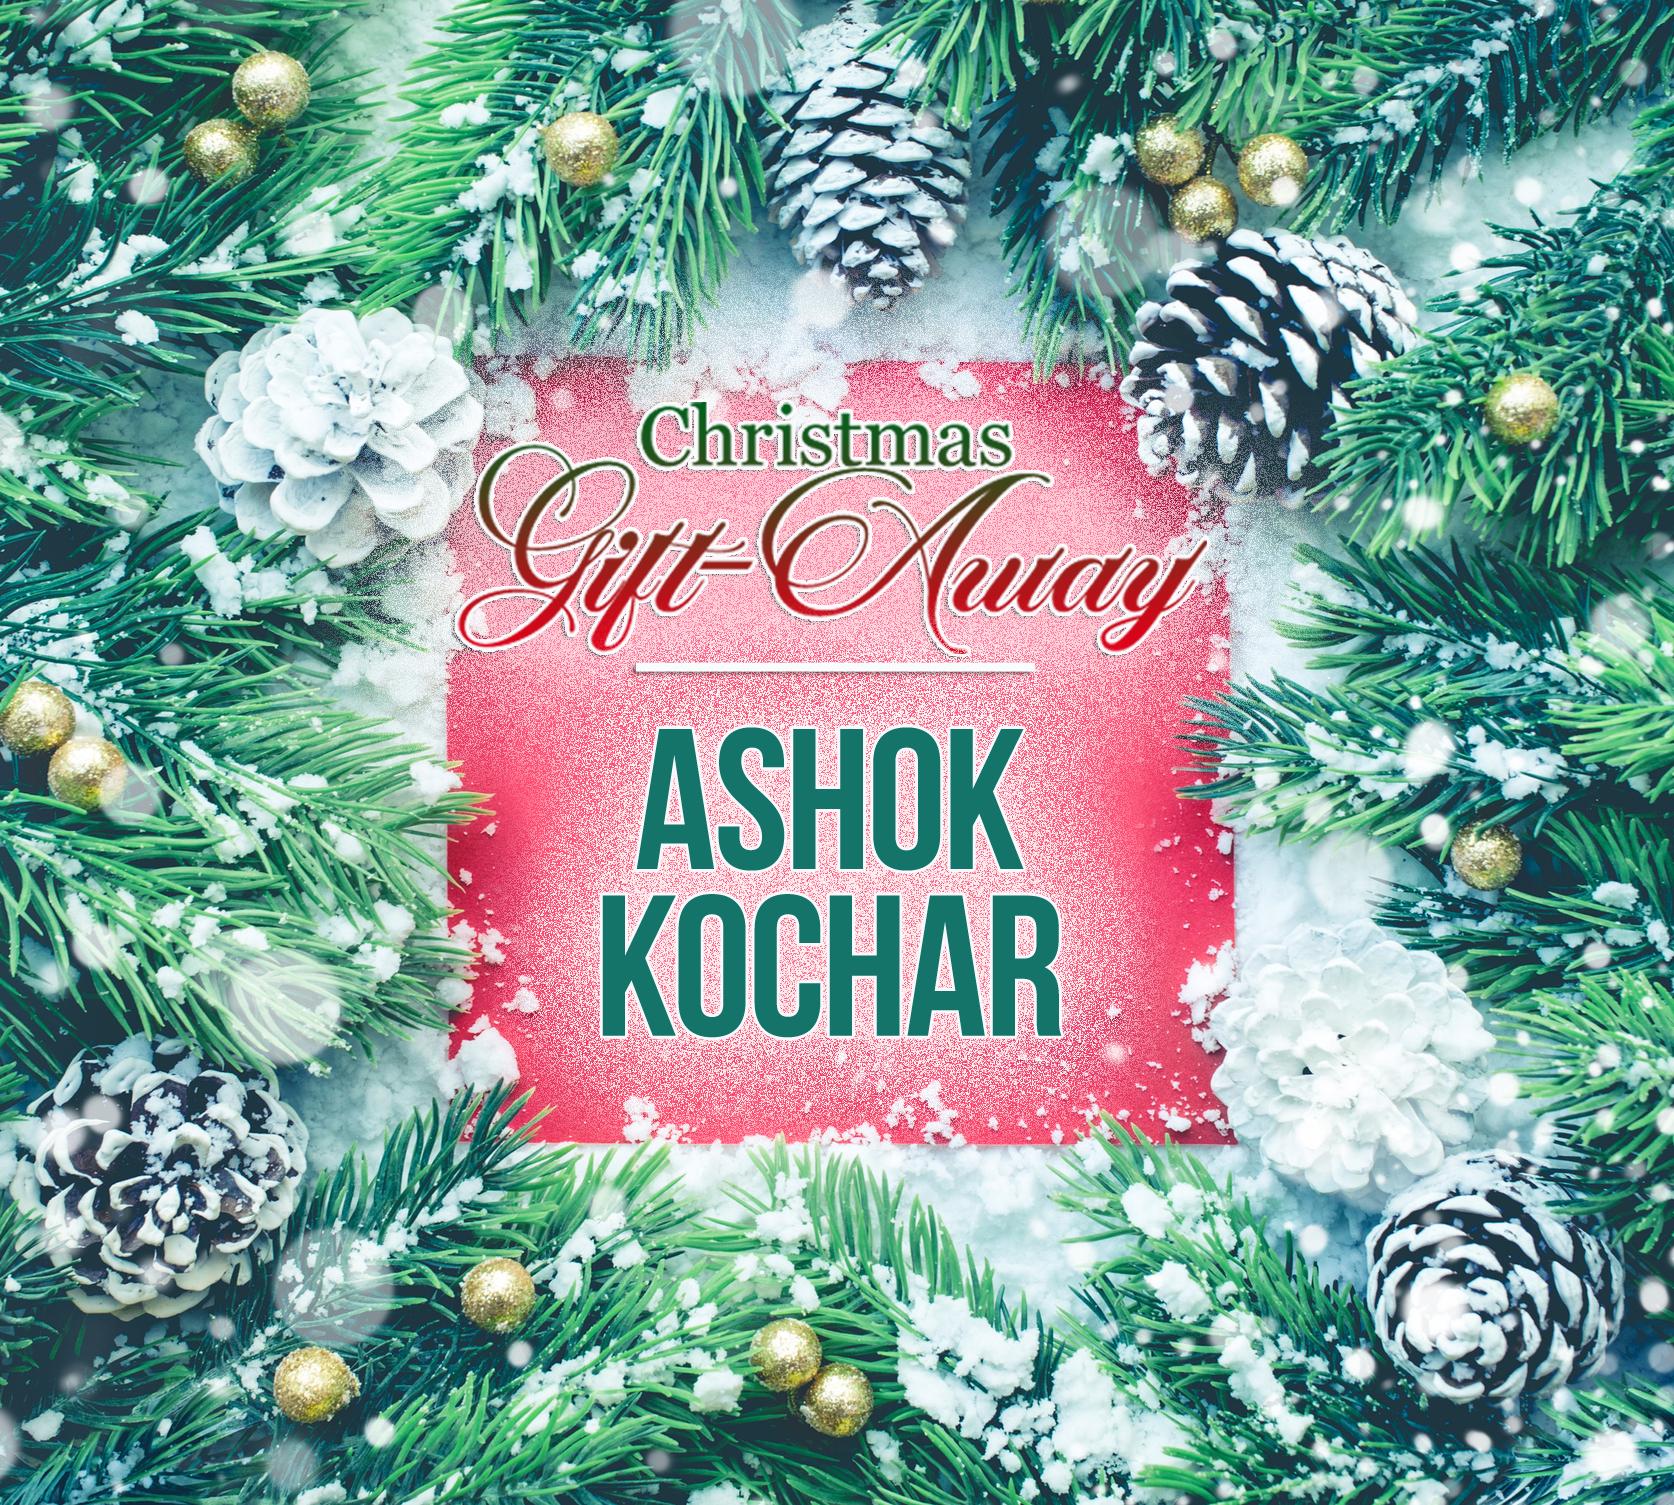 Christmas Gift Away Recipient - Ashok Kochar